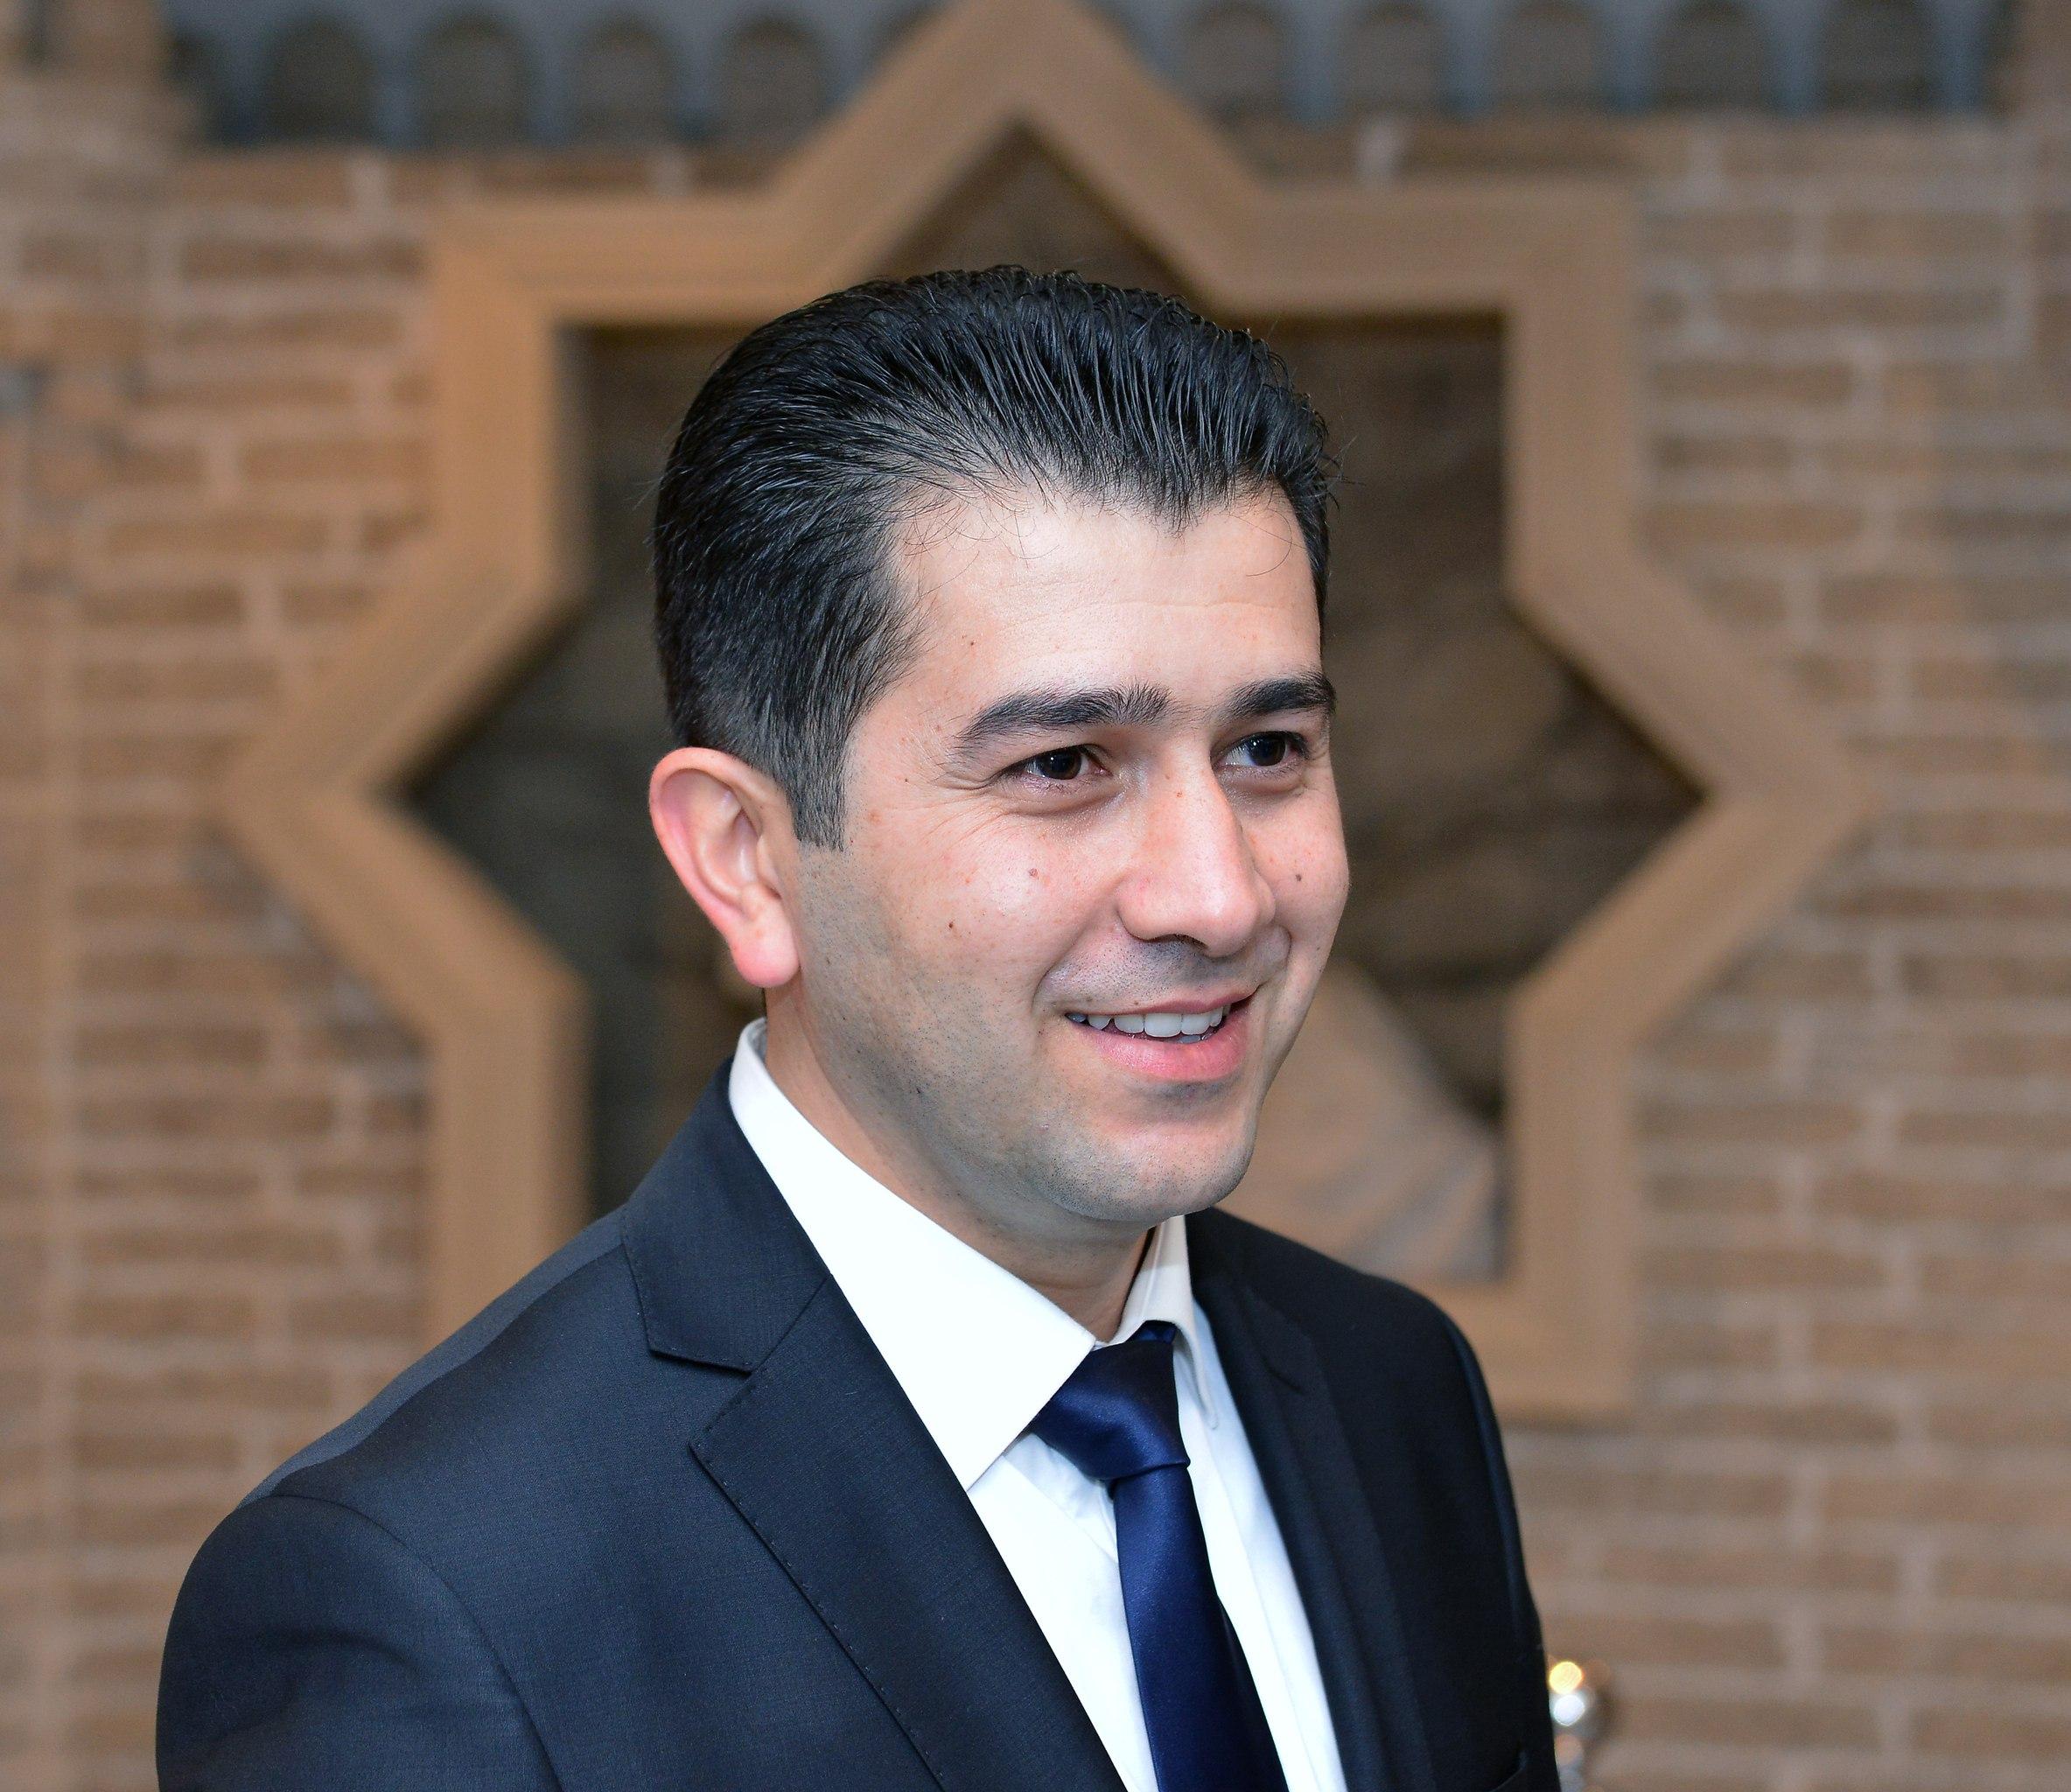 баку азербайджан мужчины фото